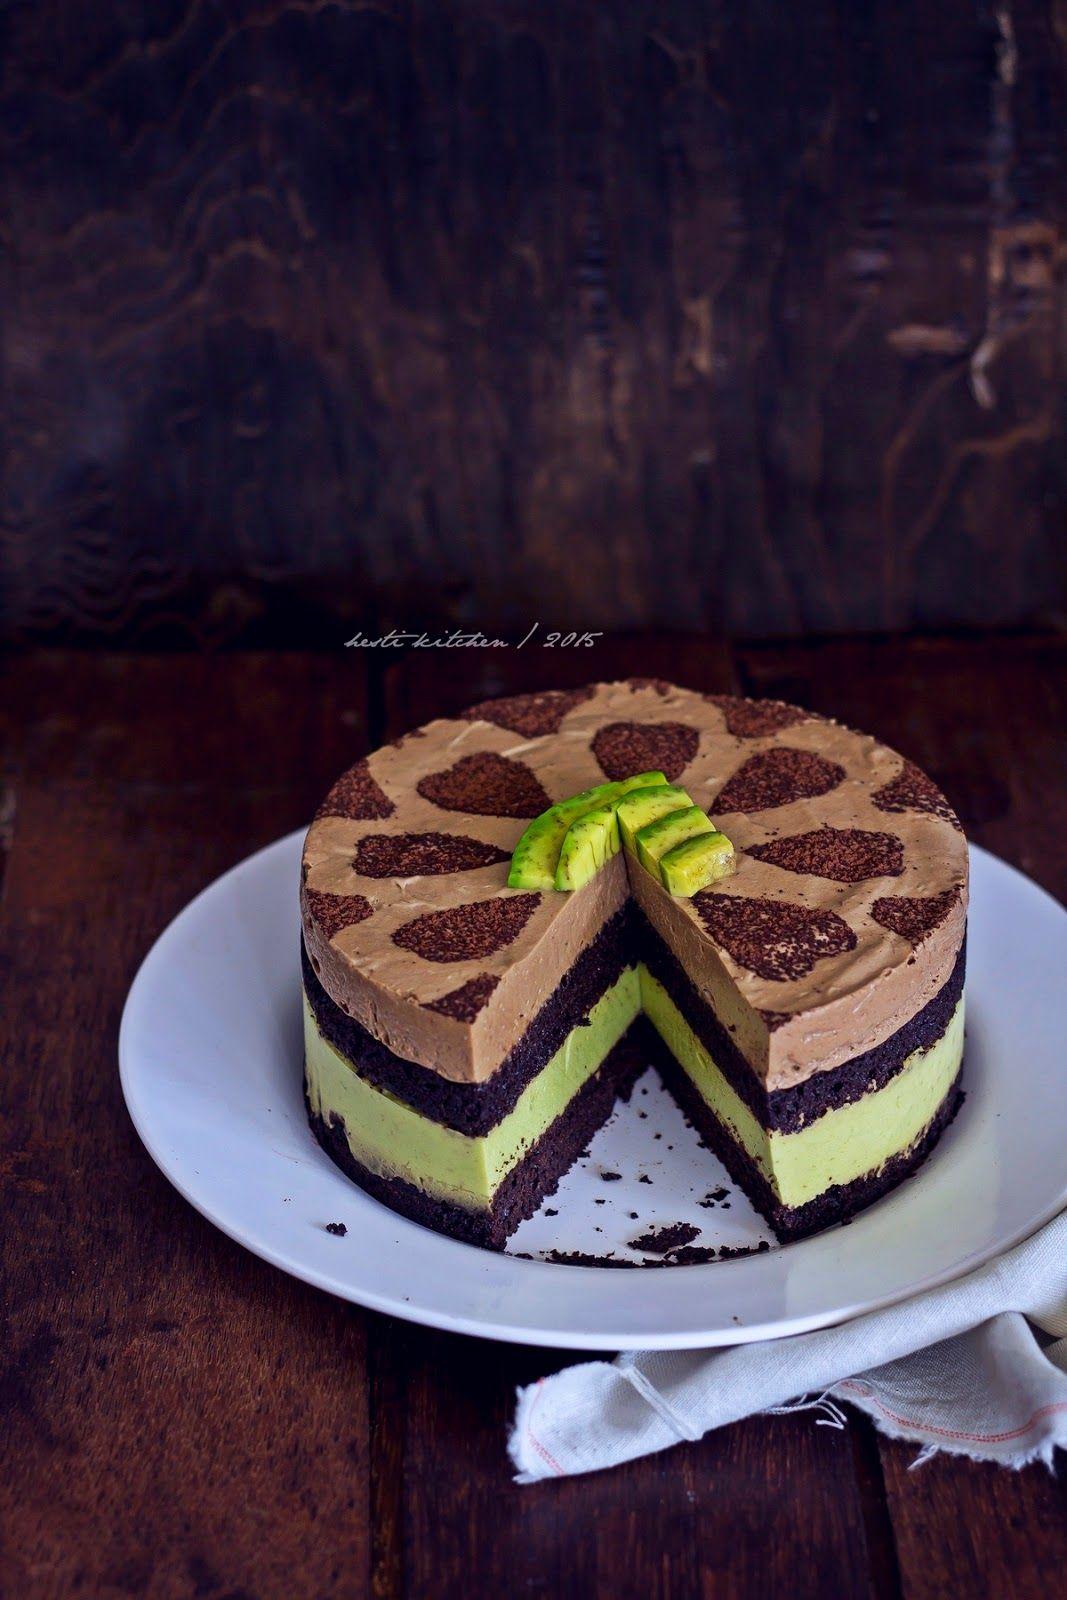 Sering Lihat Kue Ini Berseliweran Di Fbnya Mba Ina Moulina Fajrin